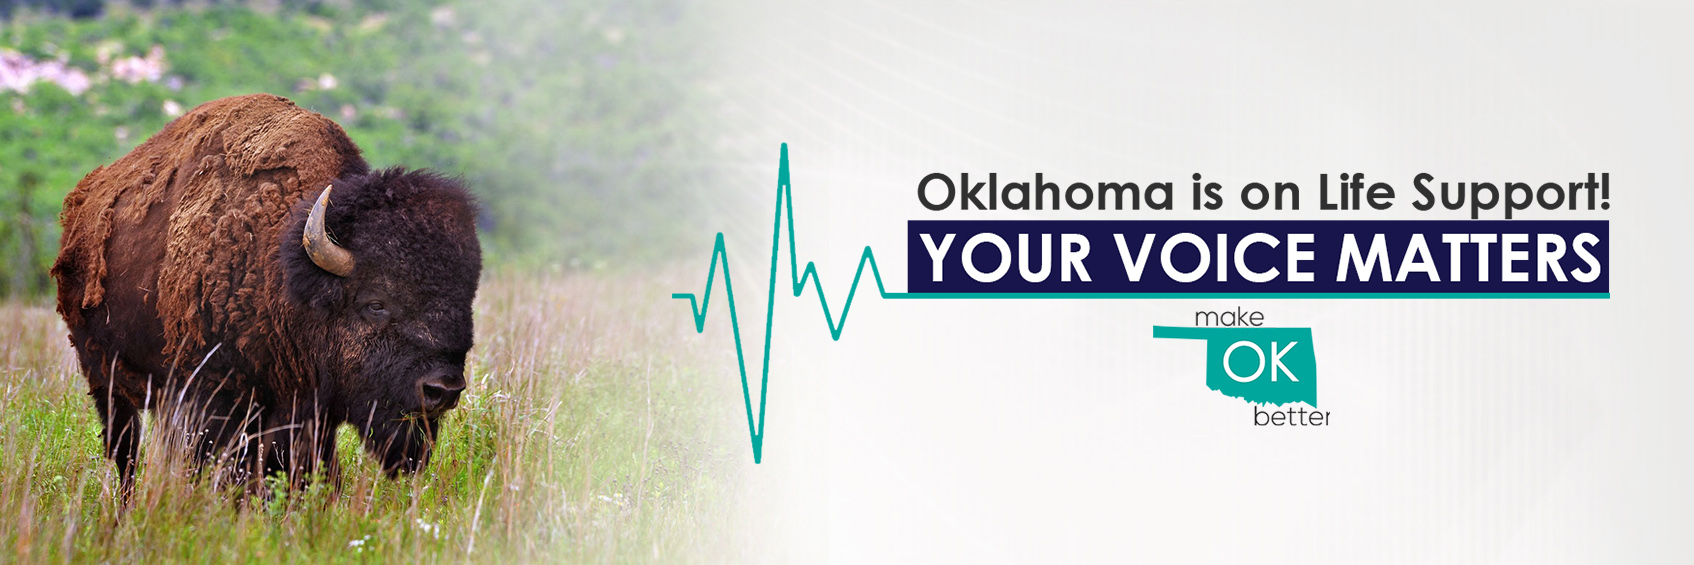 Oklahoma Life Support